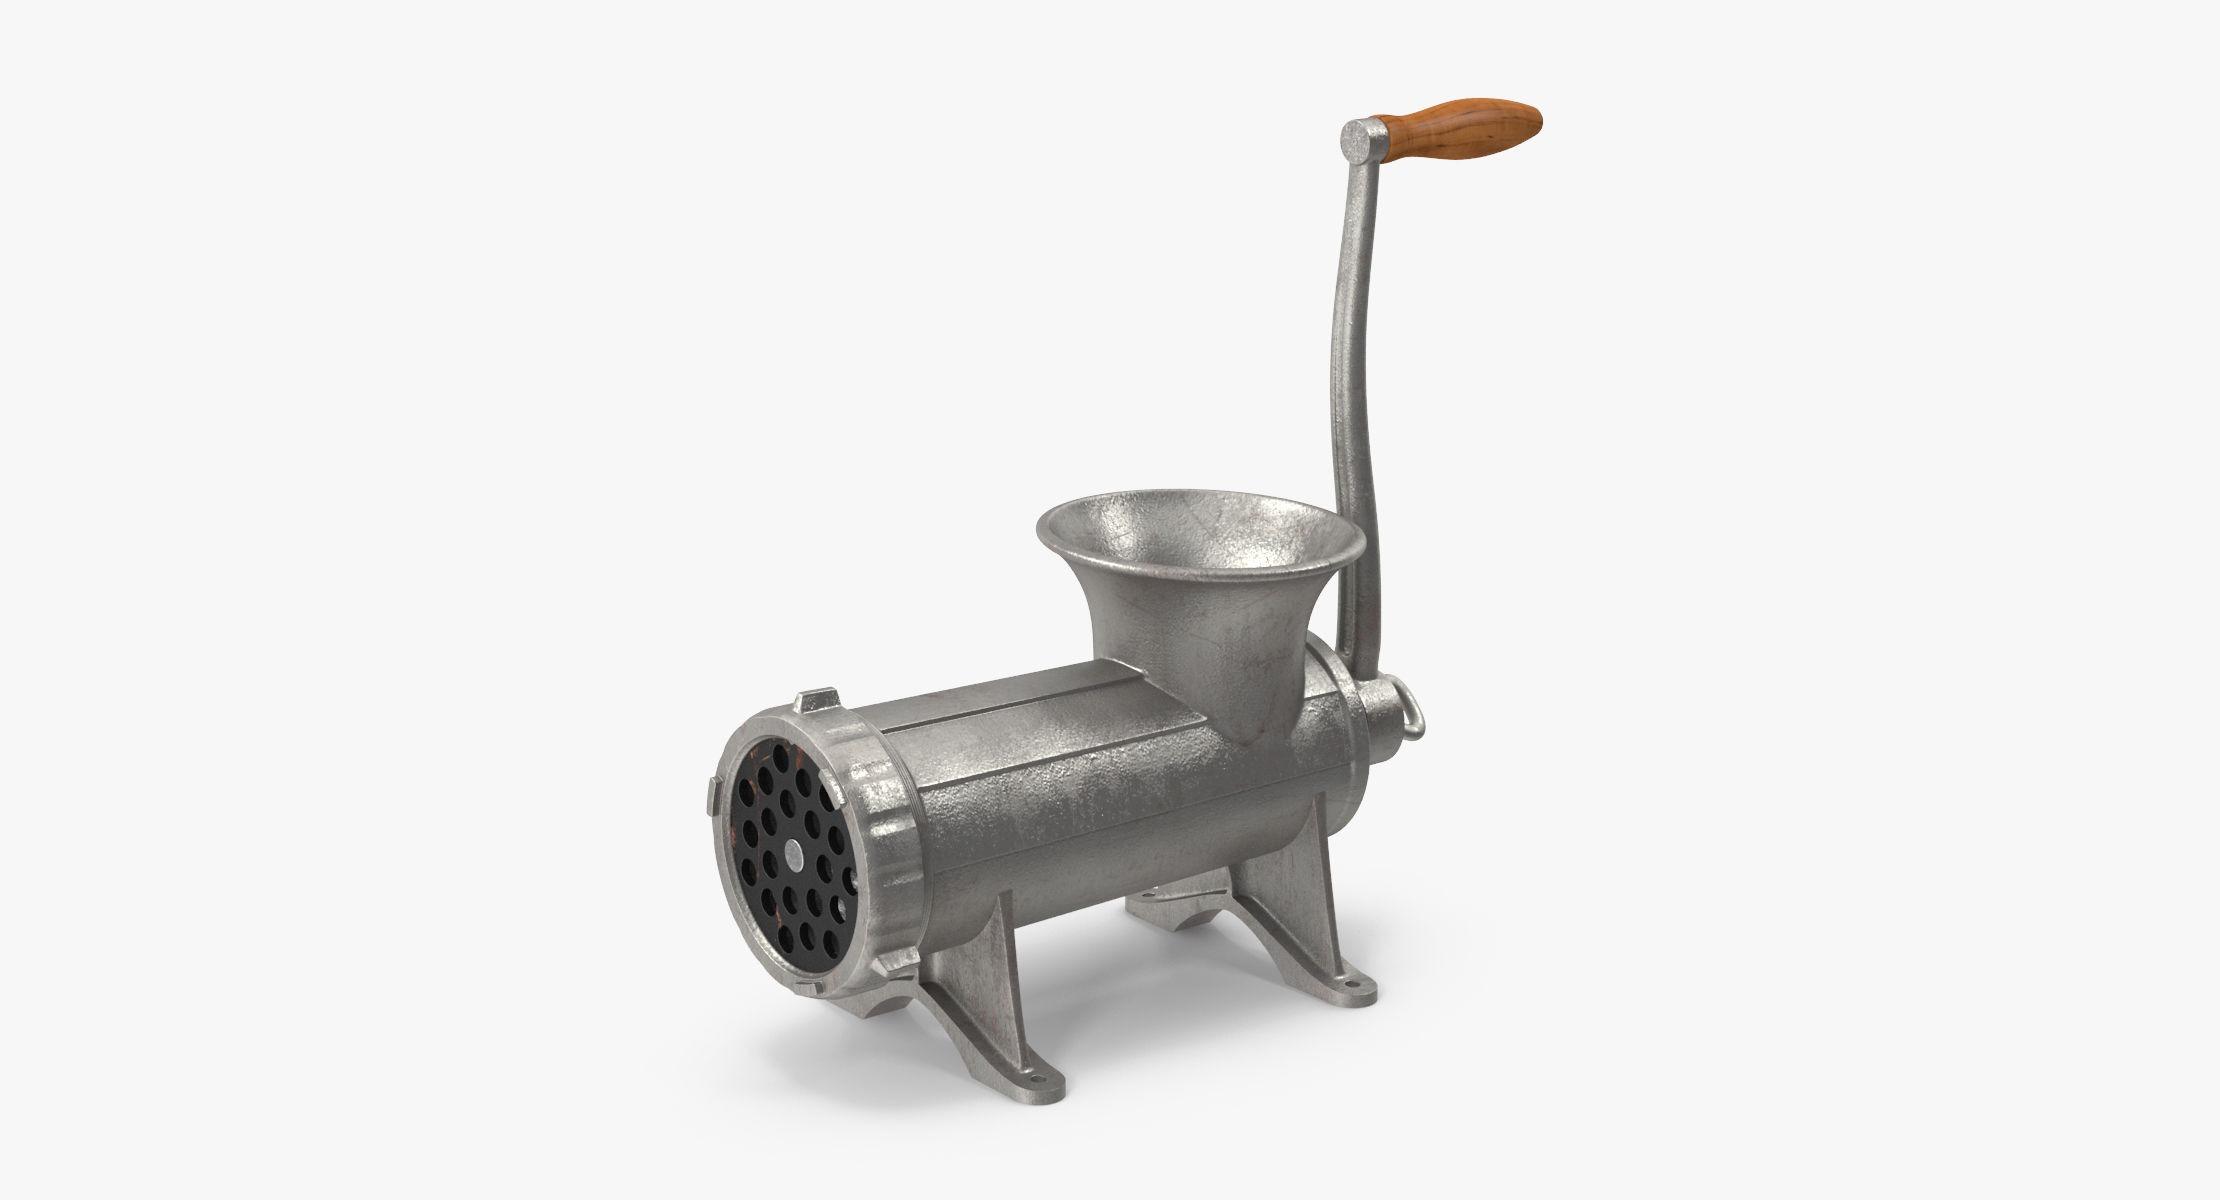 Meat Grinder - reel 1